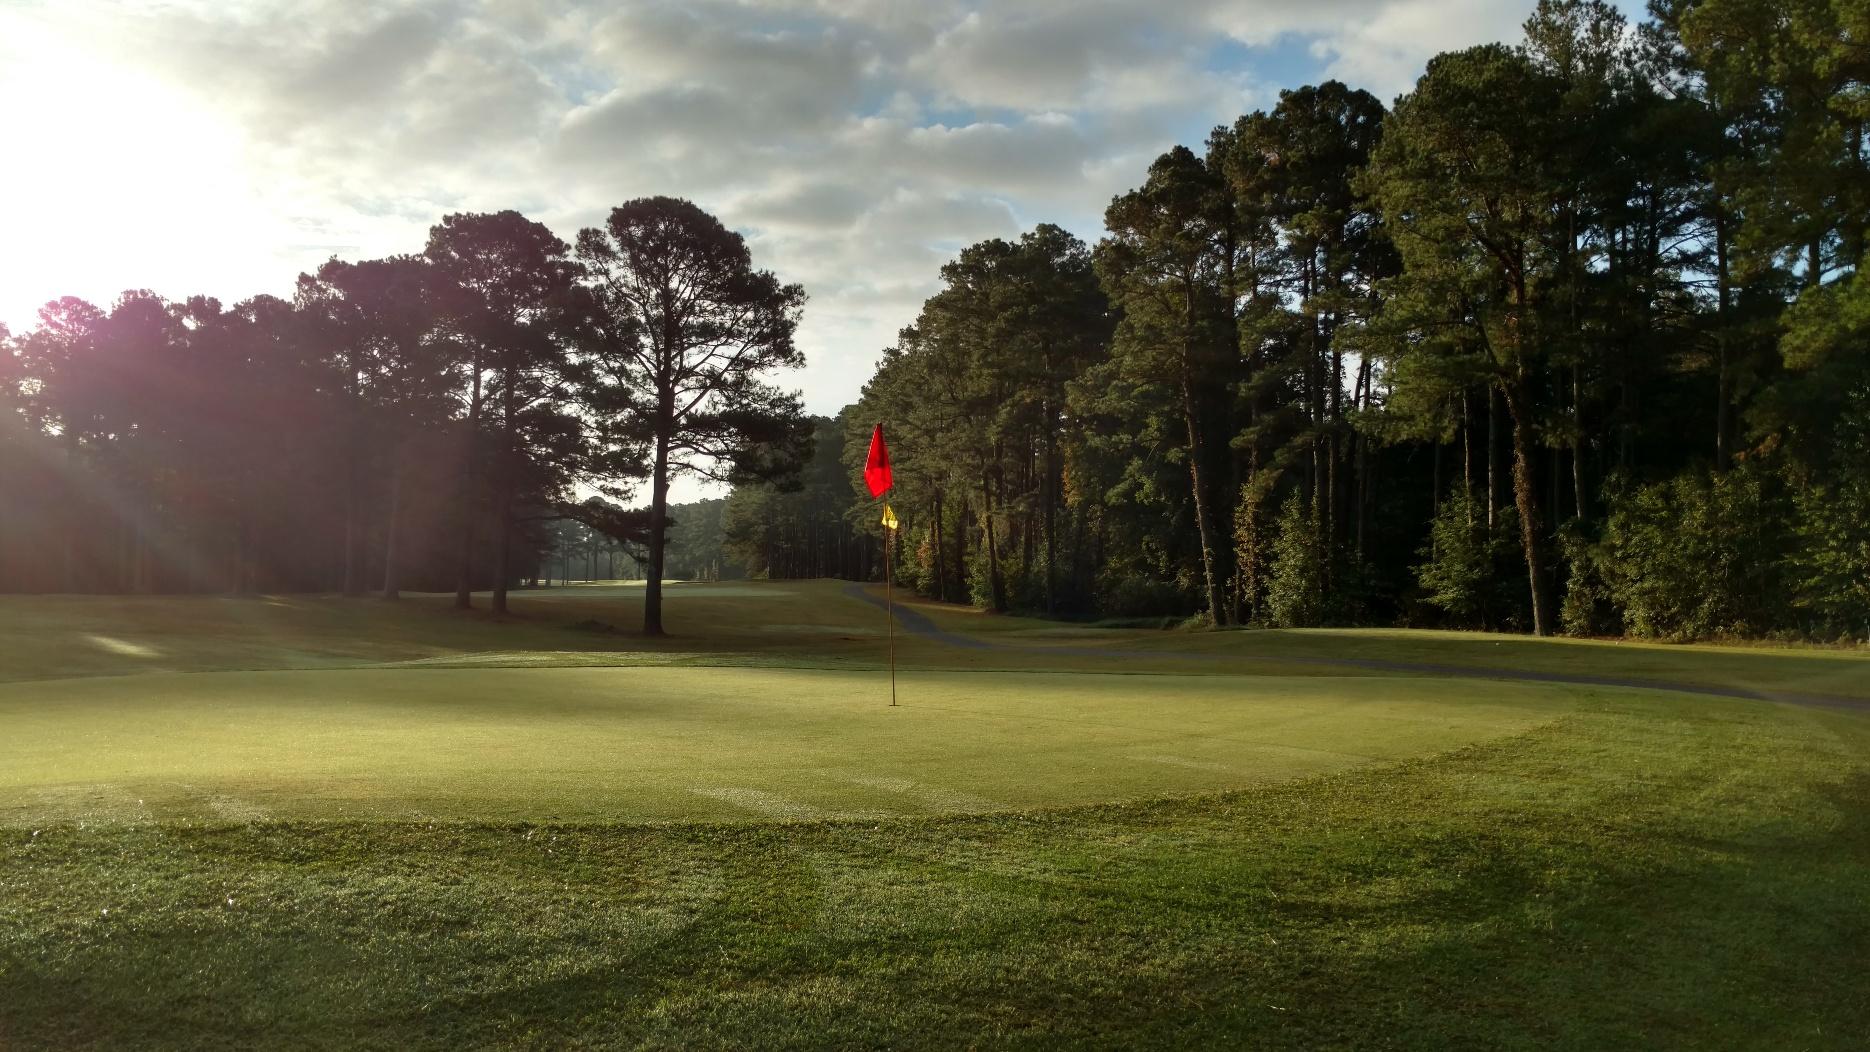 Suffolk Golf Course (Suffolk, VA on 10/07/17)